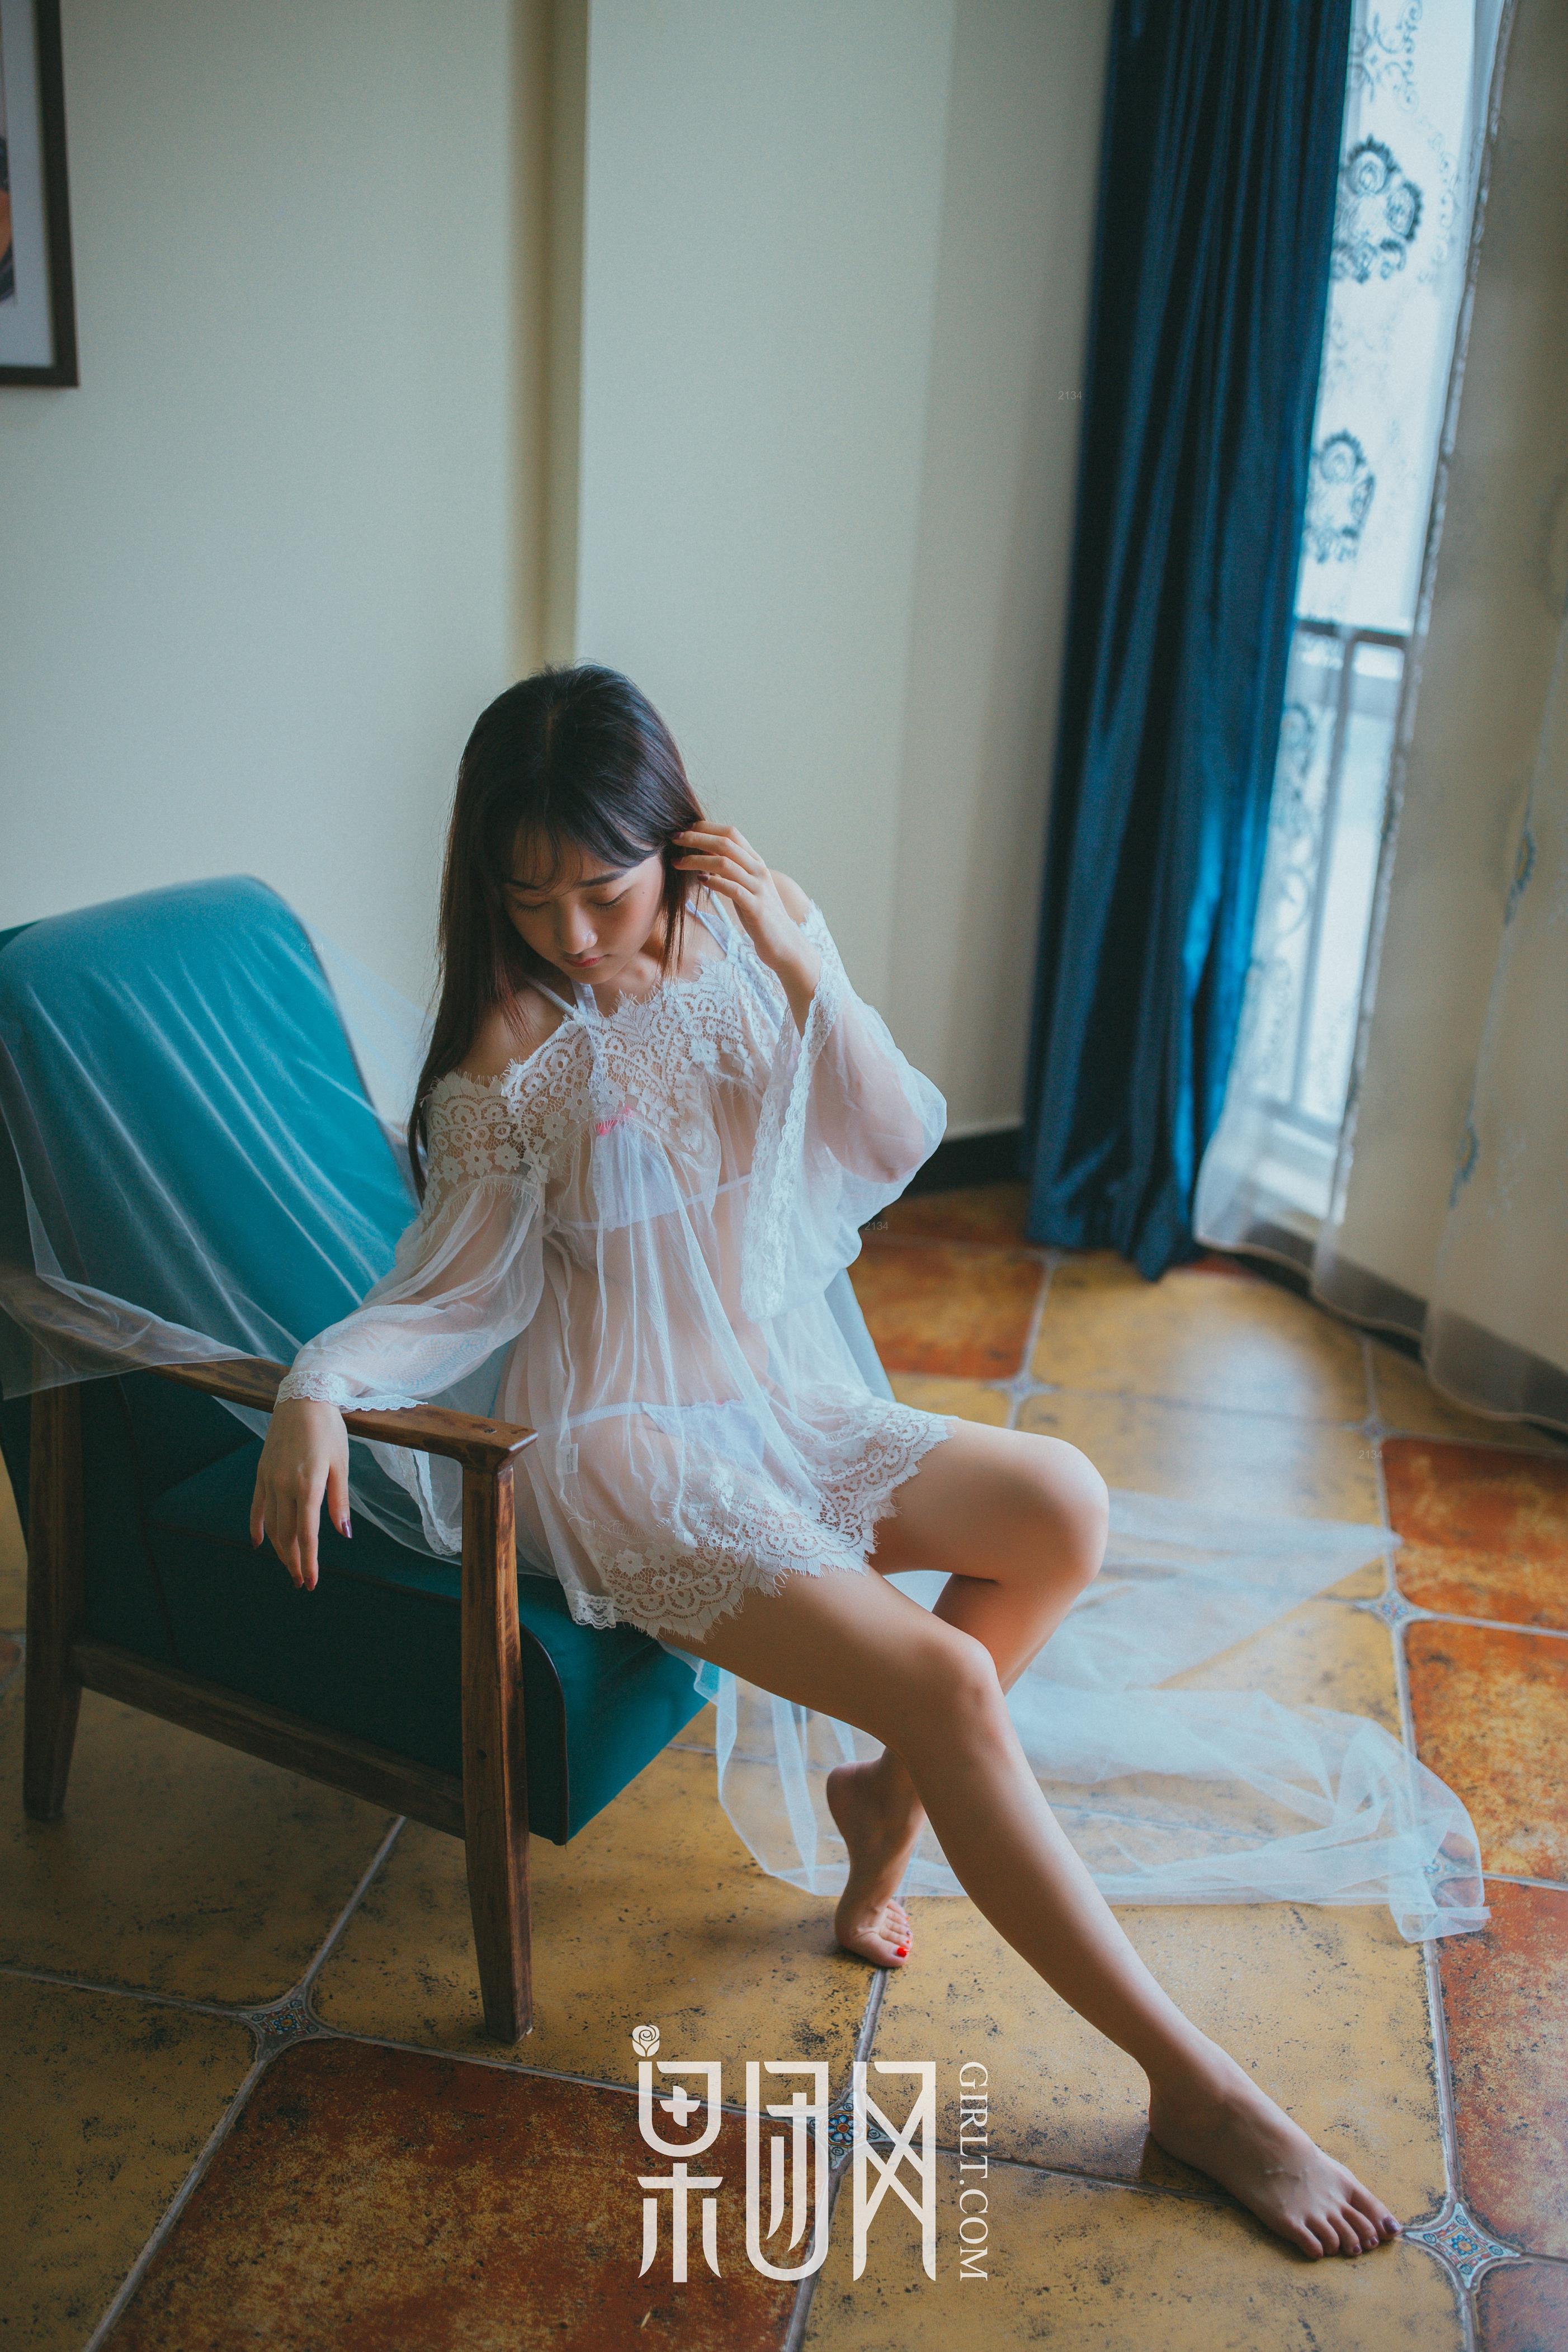 [Girlt果团网]XCJX20180126NO0017 身高&颜值&身材,完美邻家小萝莉惊喜上线!